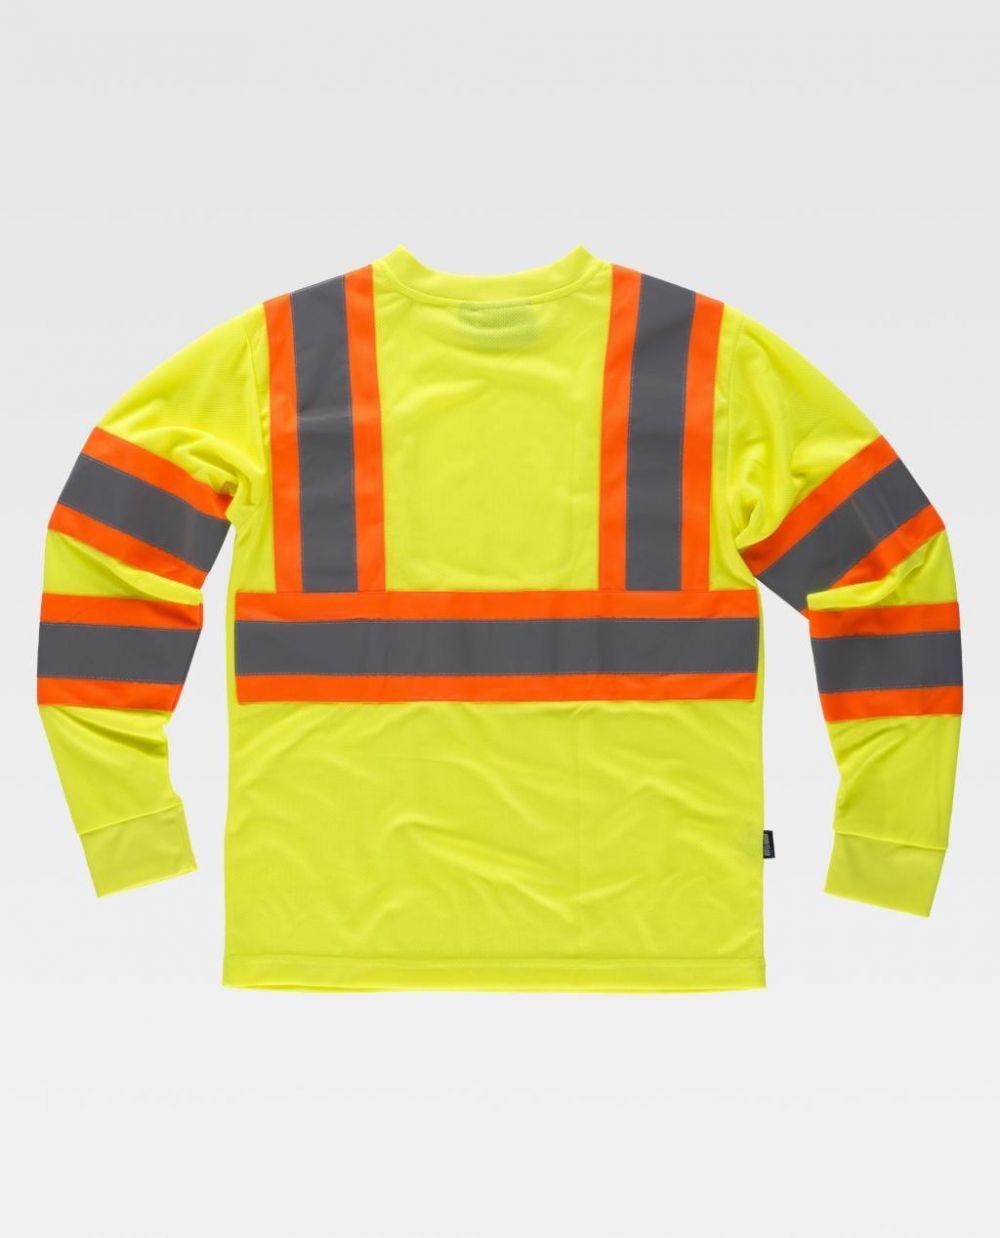 Camisetas reflectante workteam reflectante fluorescente ml de poliéster vista 1